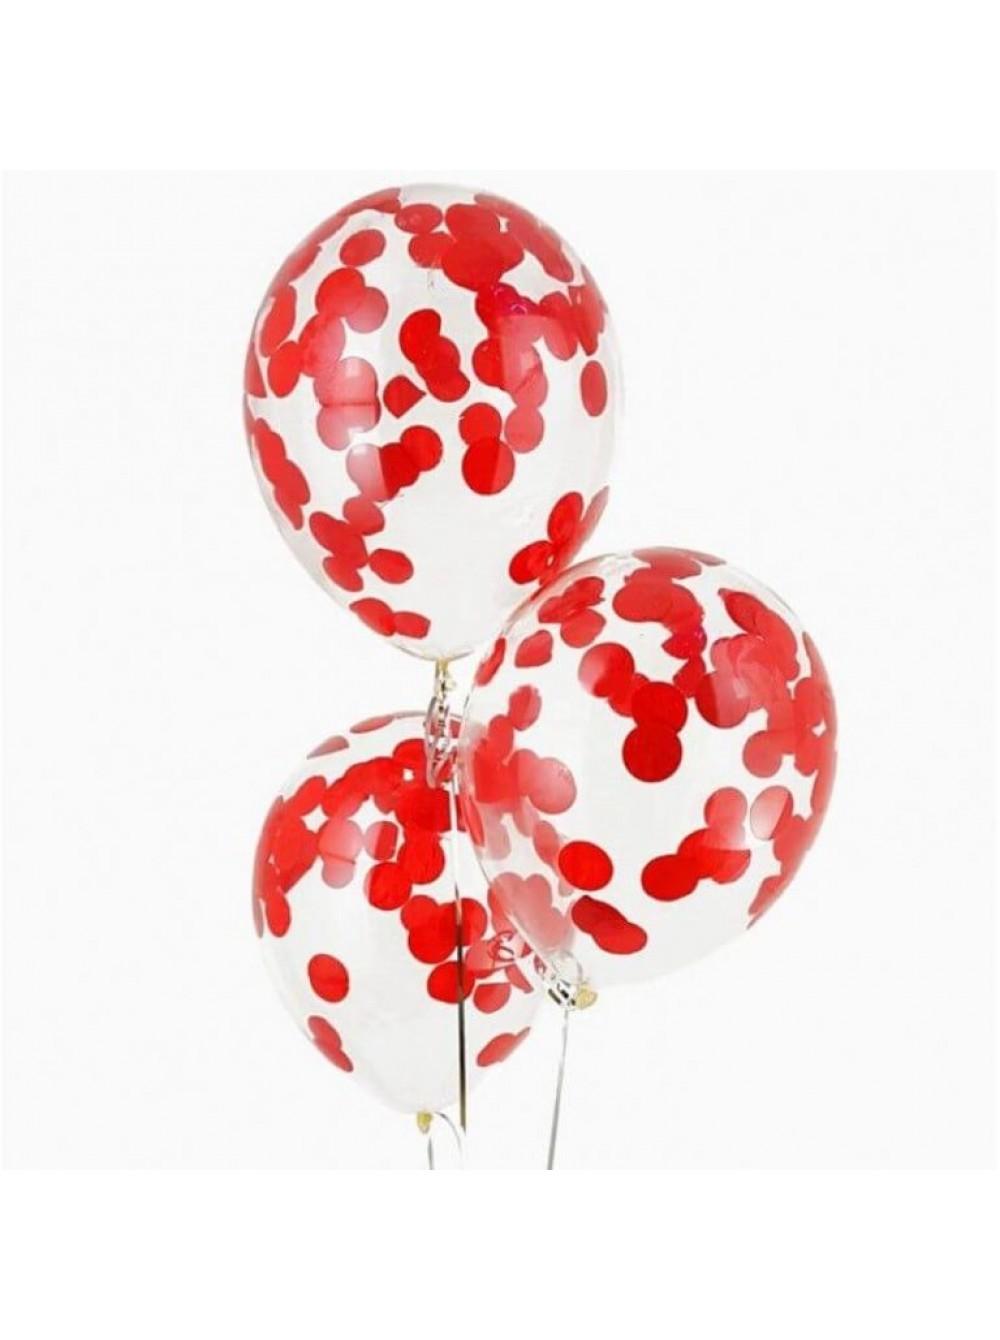 Шары с конфетти Шарики с красным конфетти shary-s-konfetti-krasnye-kruzhki-1000x1340.jpg